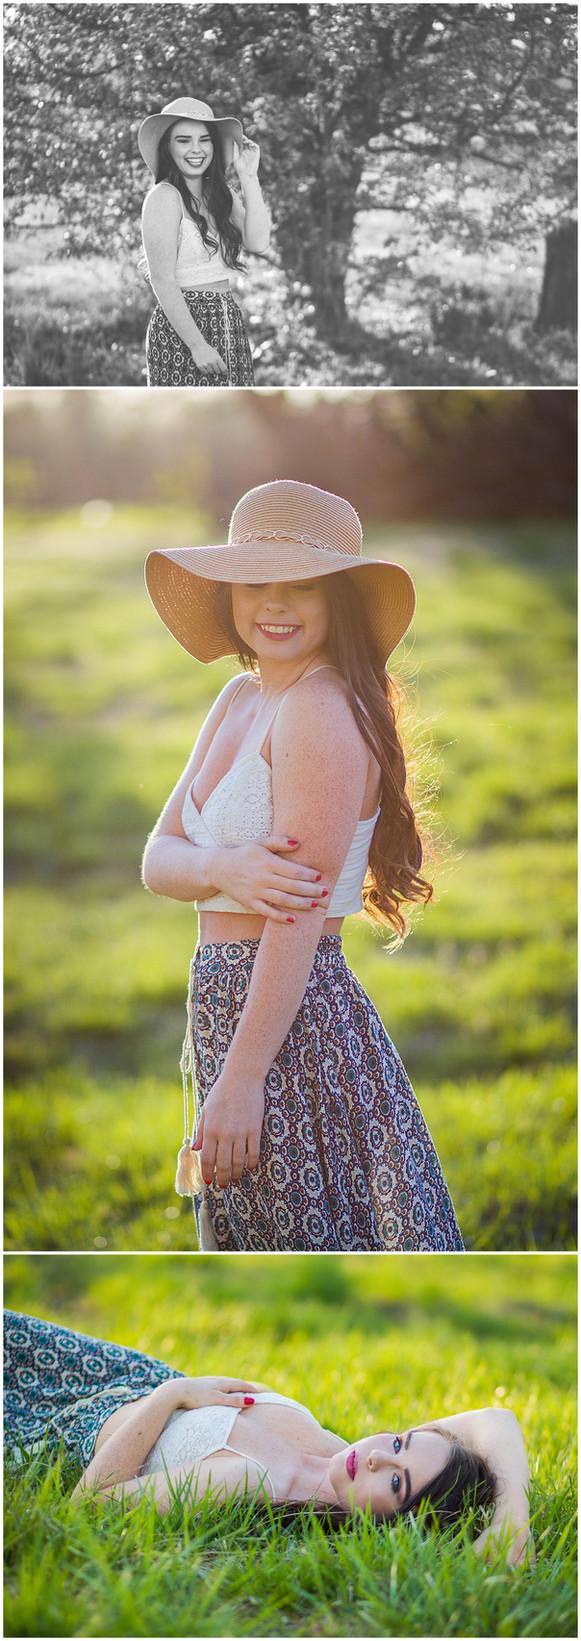 Stephanie McBee Photography - Russellville, Ar Senior Photographer - Kaylee Brasel Jasper High Schoo